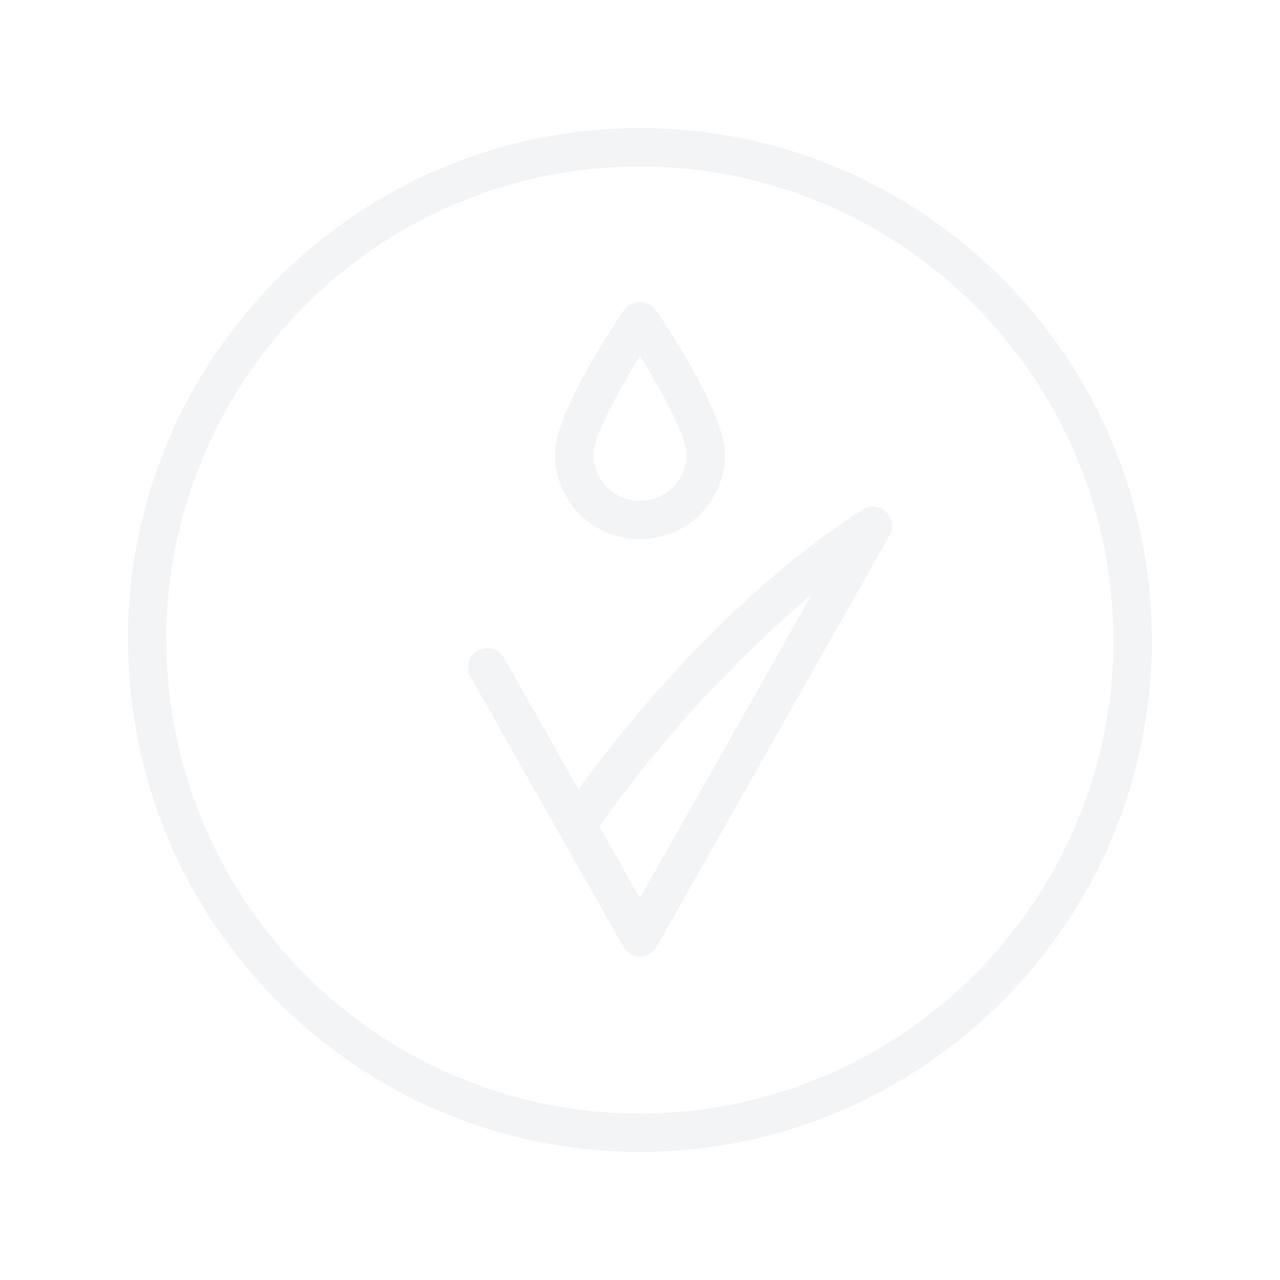 Madara Herbal Roll-On Deodorant 50ml